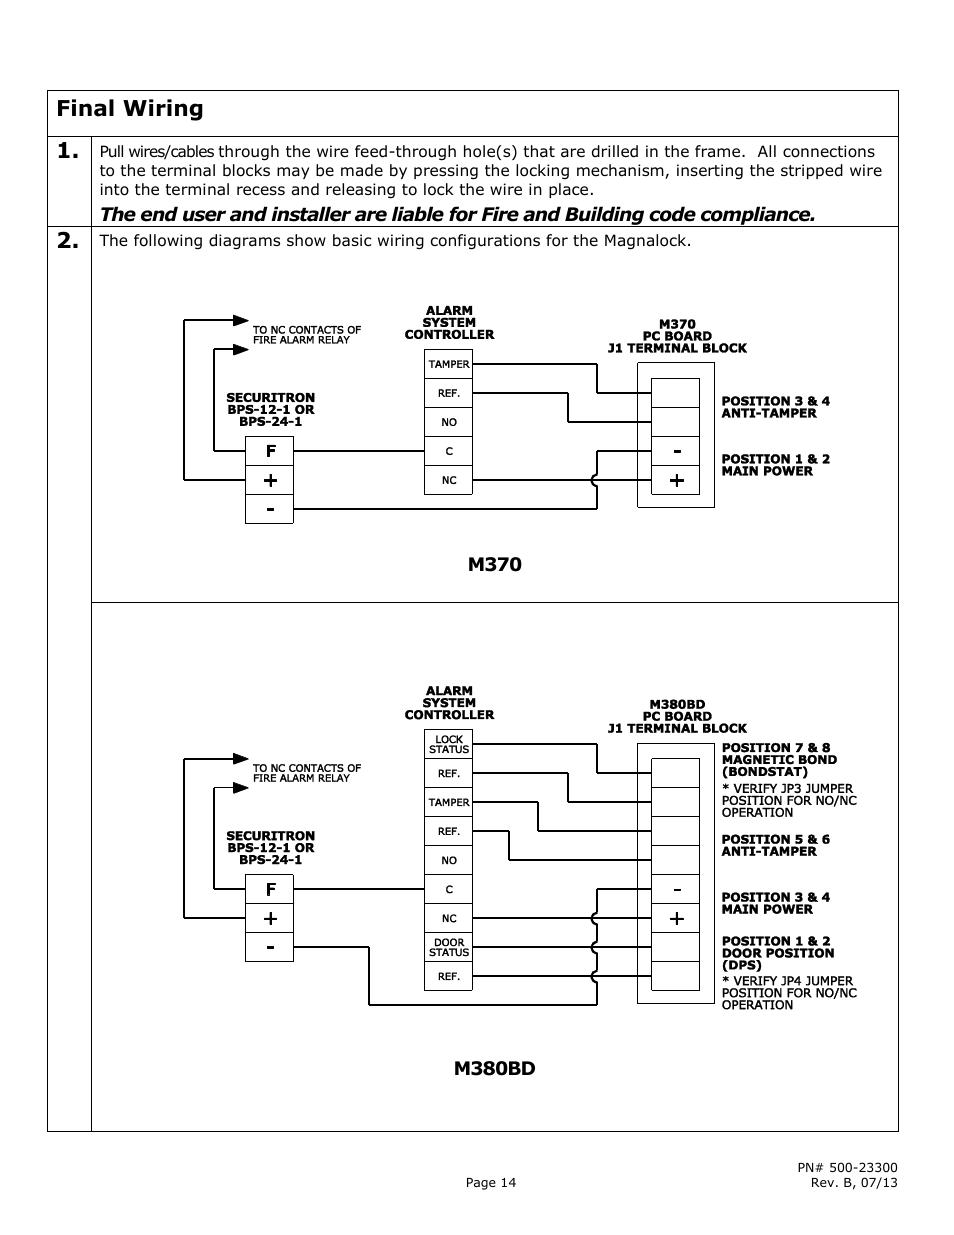 medium resolution of final wiring securitron m380bd user manual page 14 16